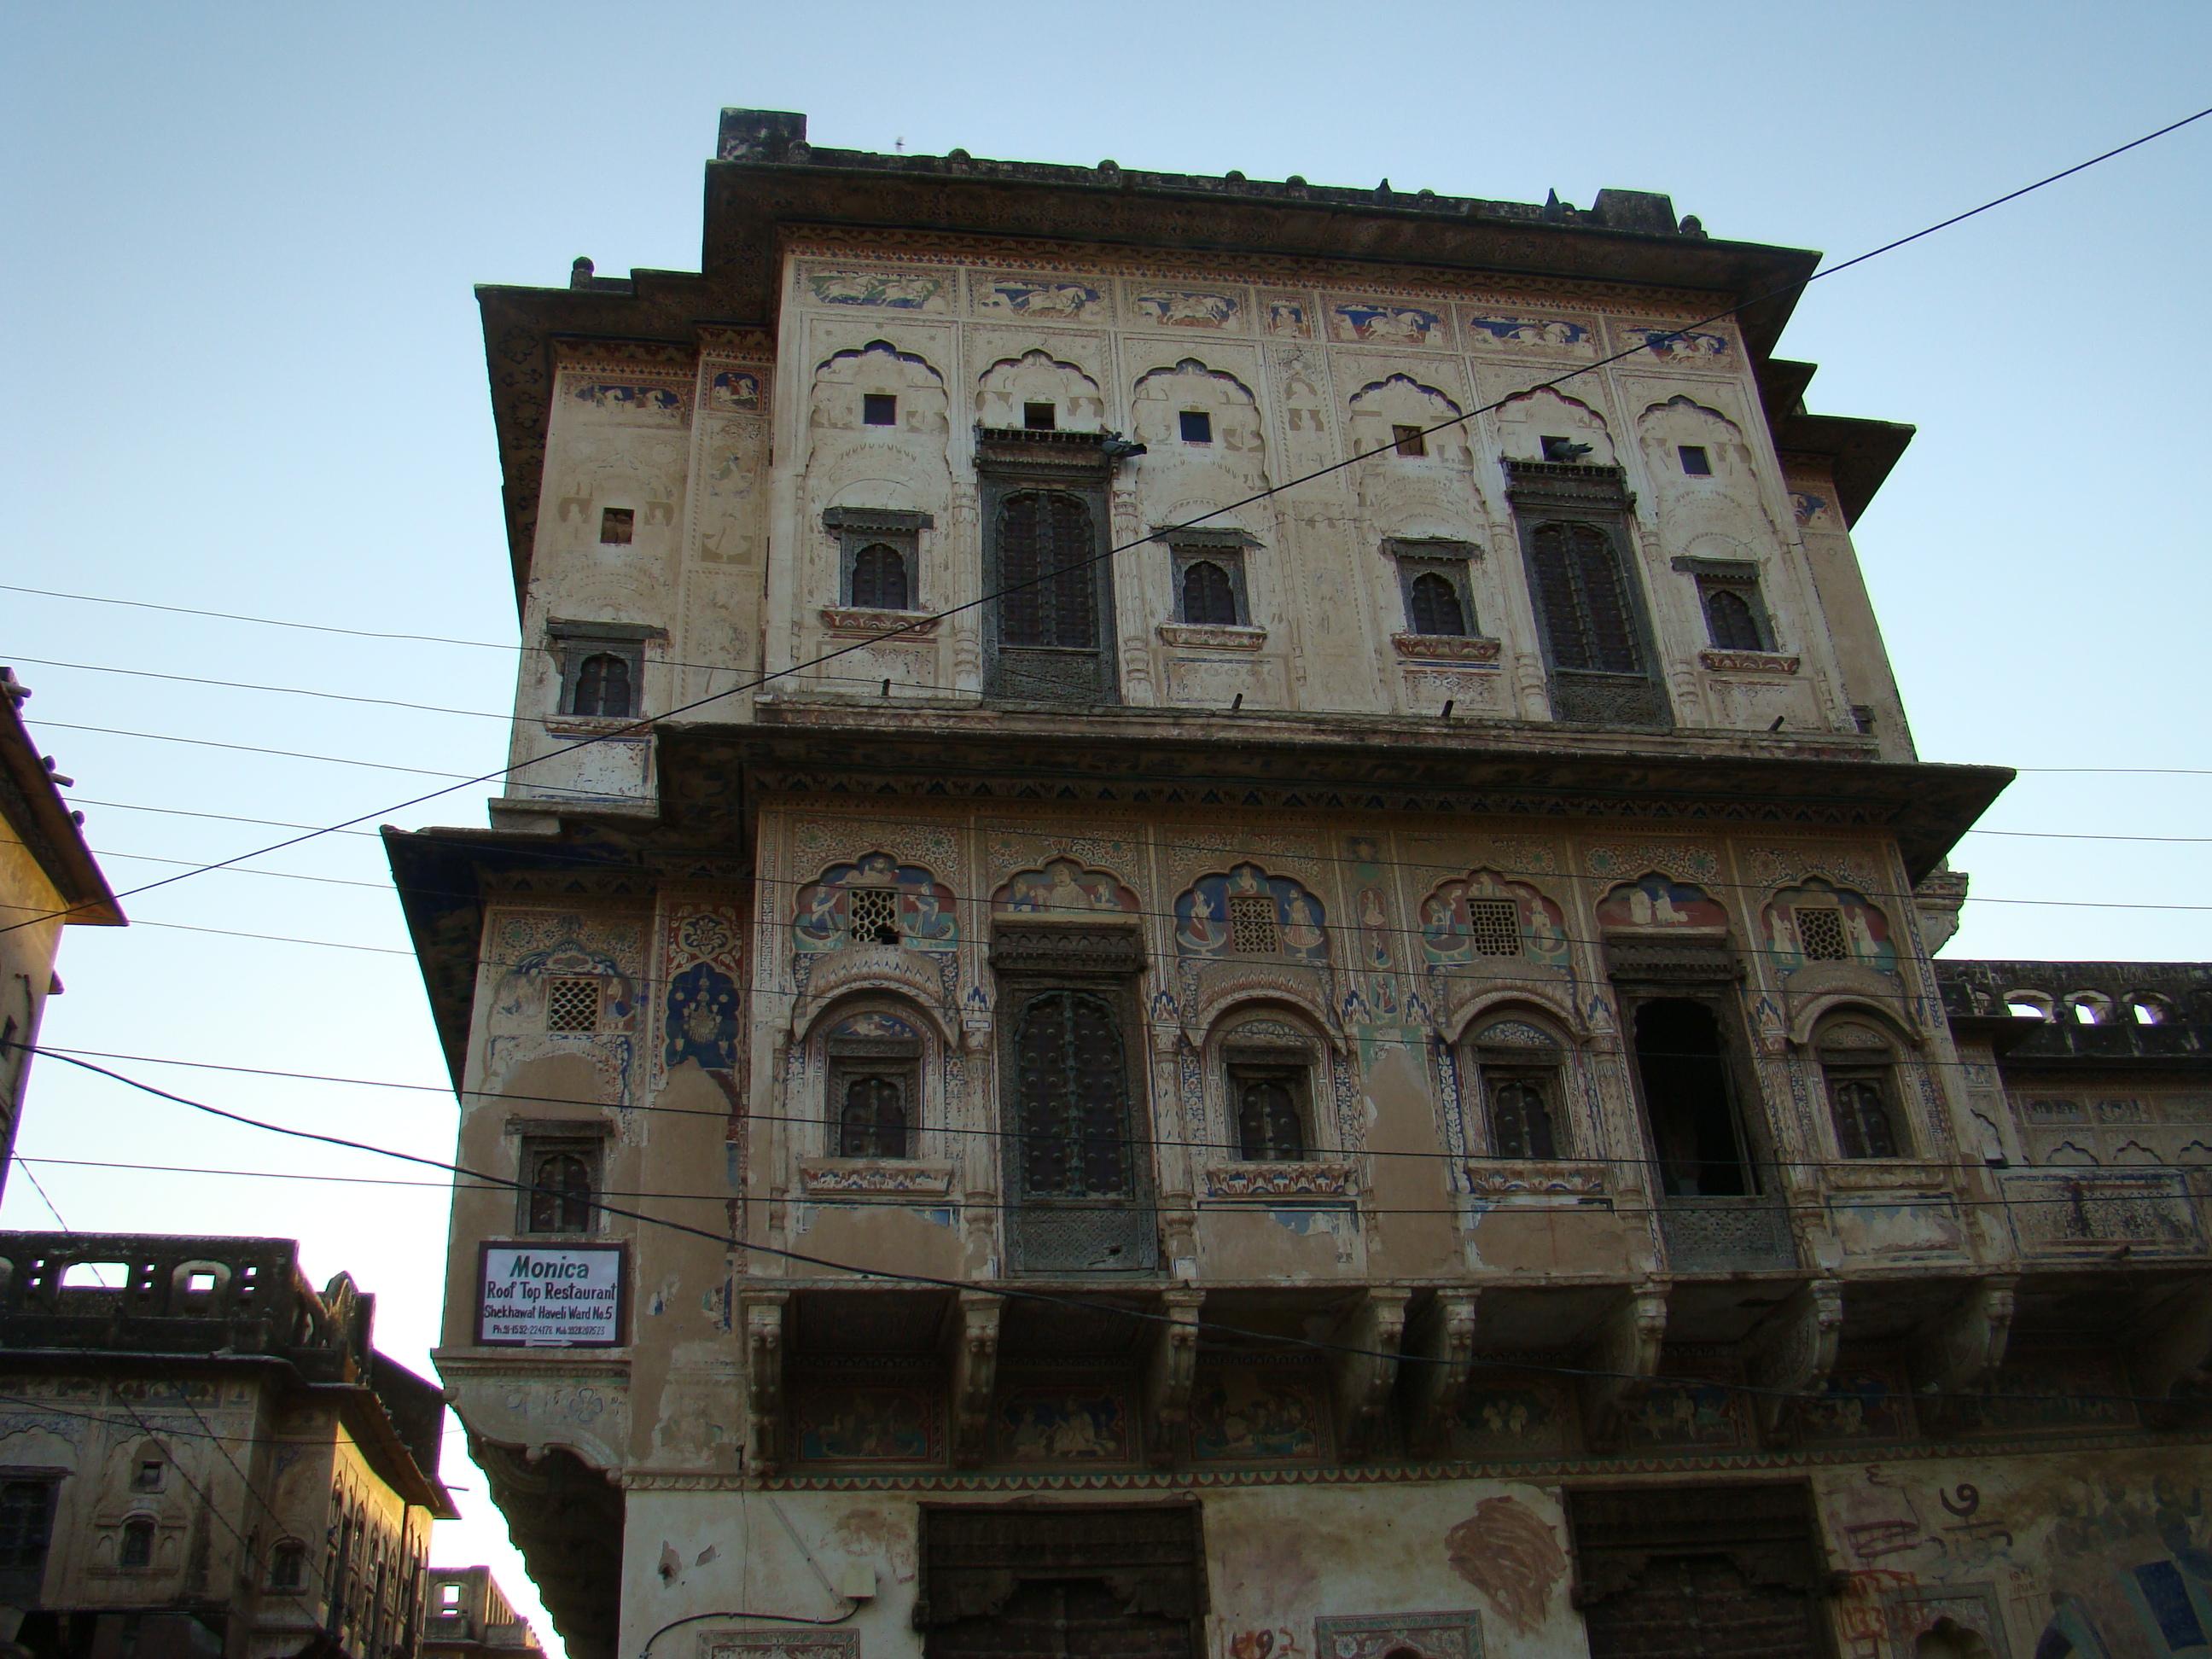 Mandawa India  city photos gallery : India Mandawa haveli 03 ni Wikimedia Commons